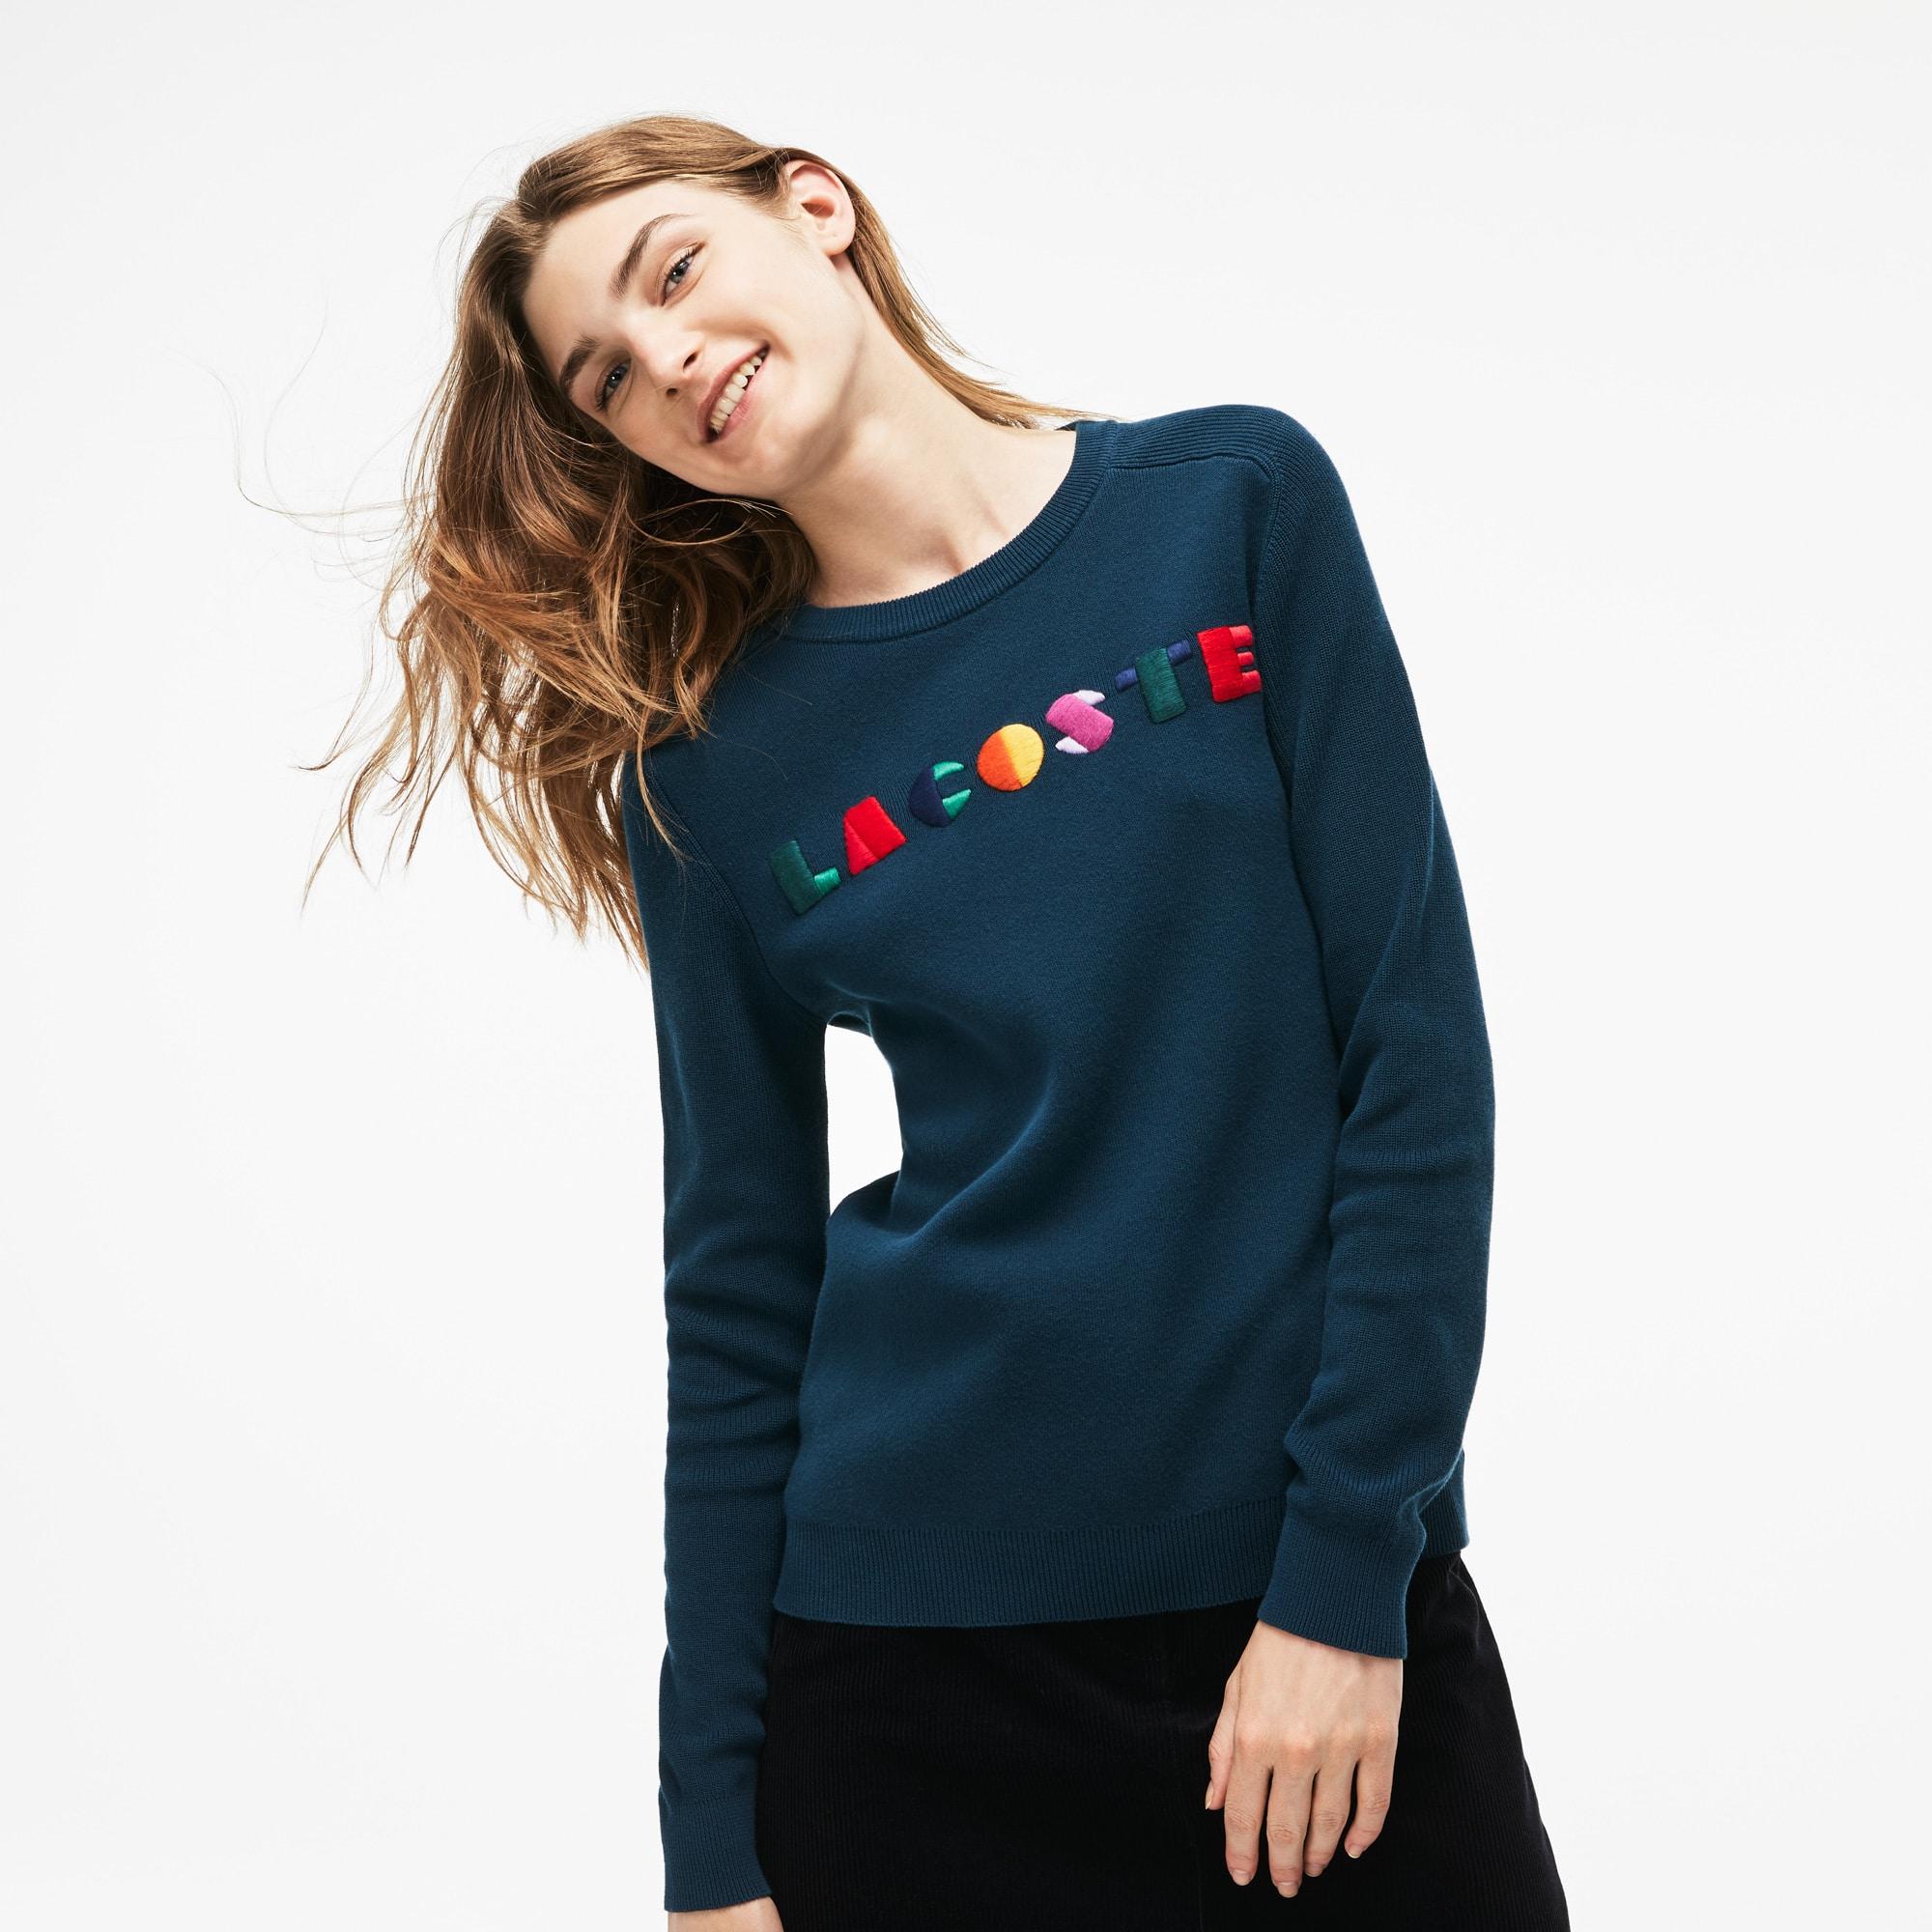 64efbf44 Women's Crew Neck Multicolor Embroidery Interlock Sweater ...